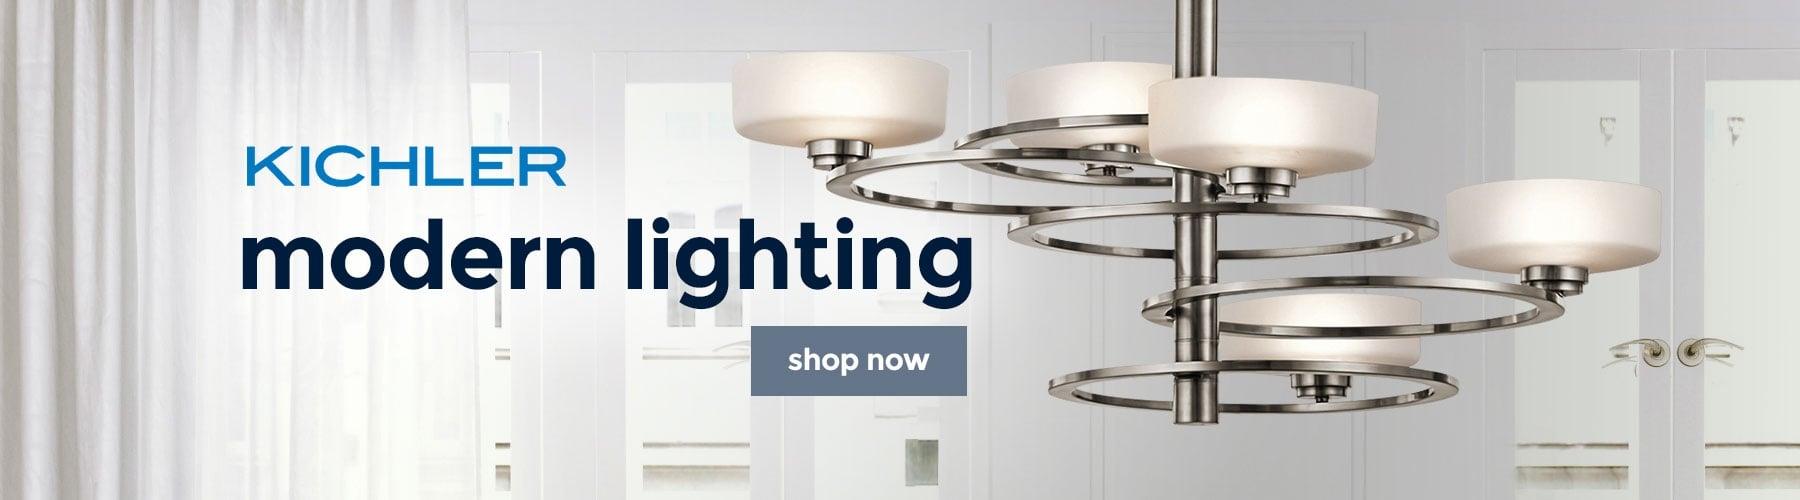 Atro Bathroom Lighting Kichler